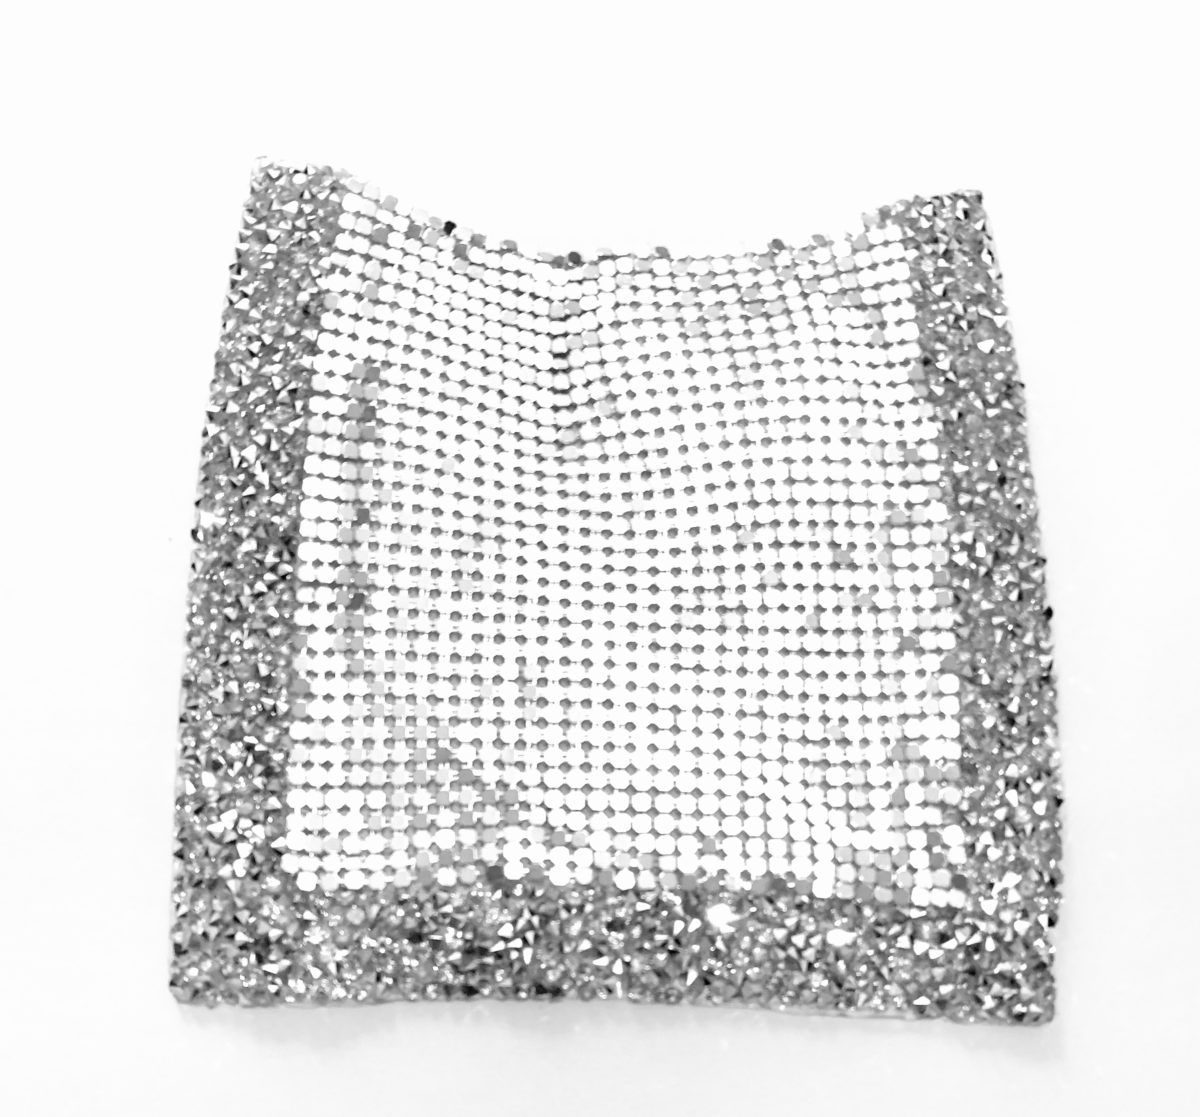 NEW Rhinestone Pocket Patch, Applique,  Iron On, Hot fix,  DIY clothing 1